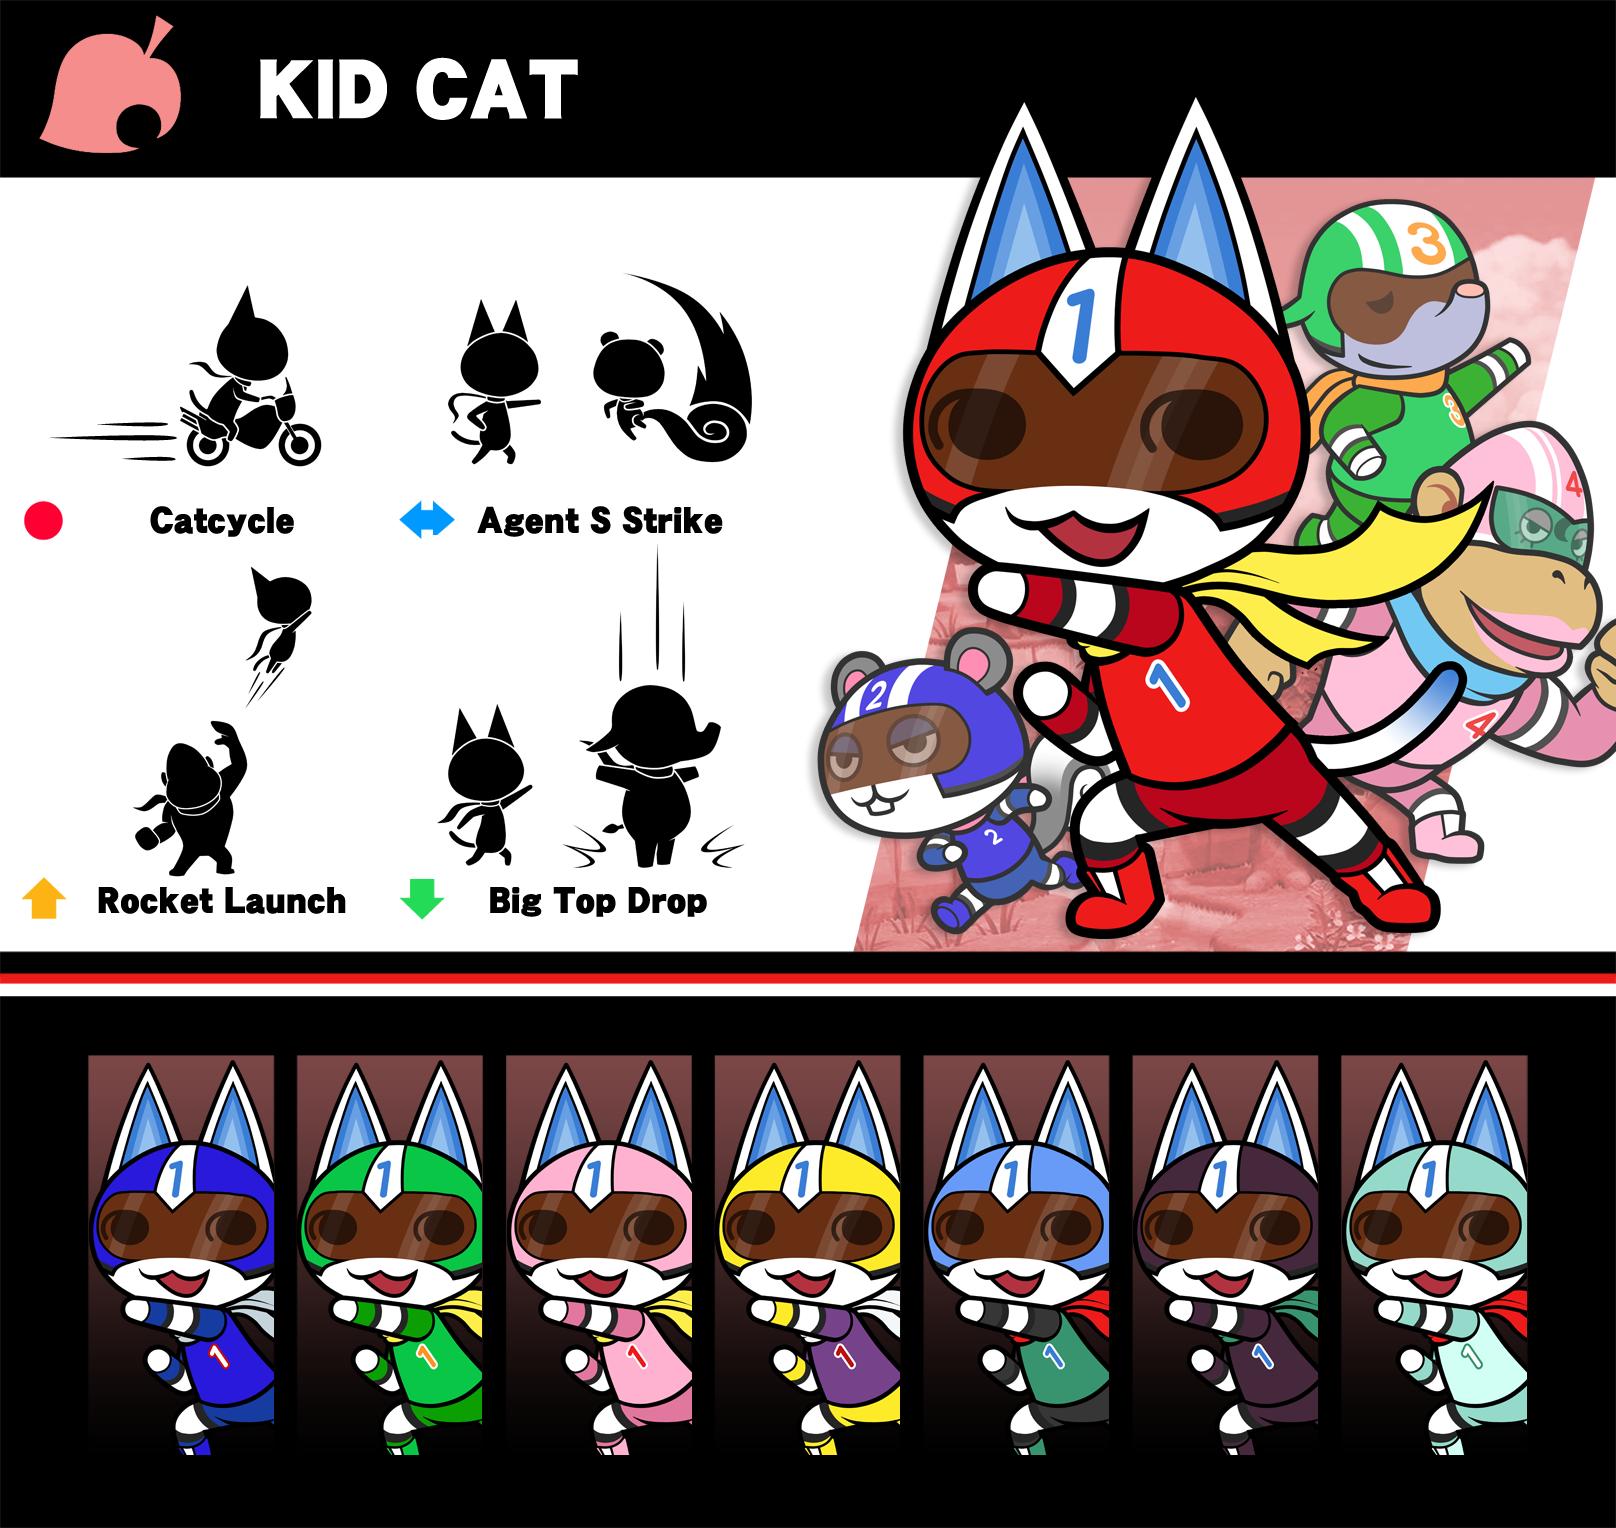 Super Smash Bros Kid Cat By P Fritz On Deviantart